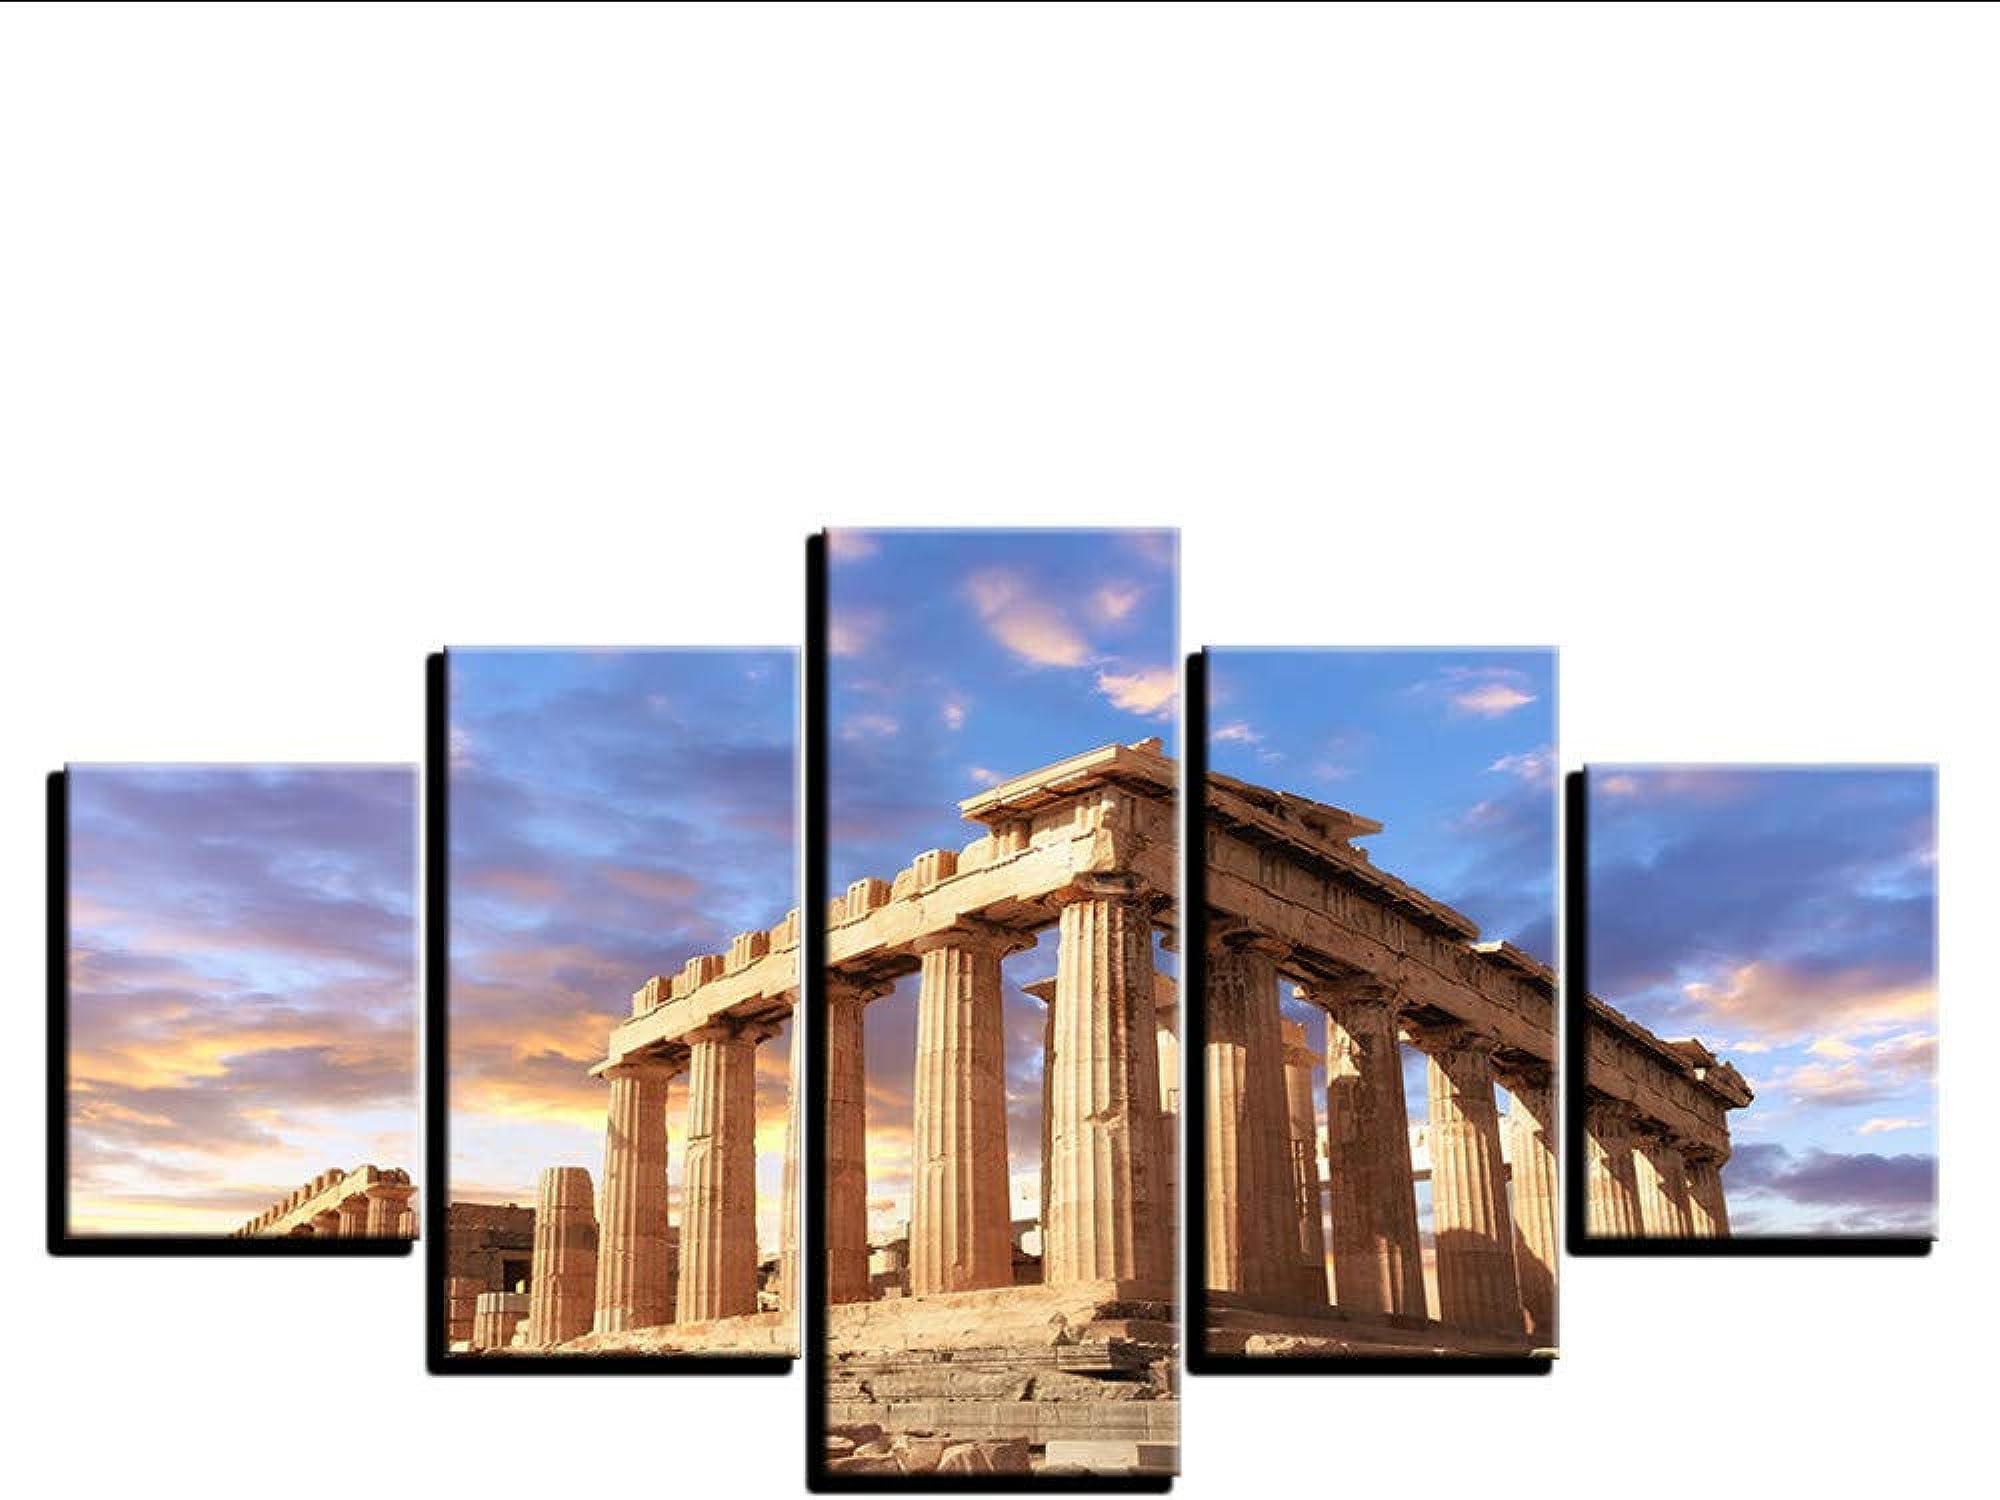 salida Guyuell HD Wall Posters Home Decoration Art Pictures Moderno Moderno Moderno 5 Panel Acrópolis Edificio Paisaje para La Sala De Estar Pintura Impresa-20Cmx35 45 55Cm,with Frame  Ahorre 60% de descuento y envío rápido a todo el mundo.